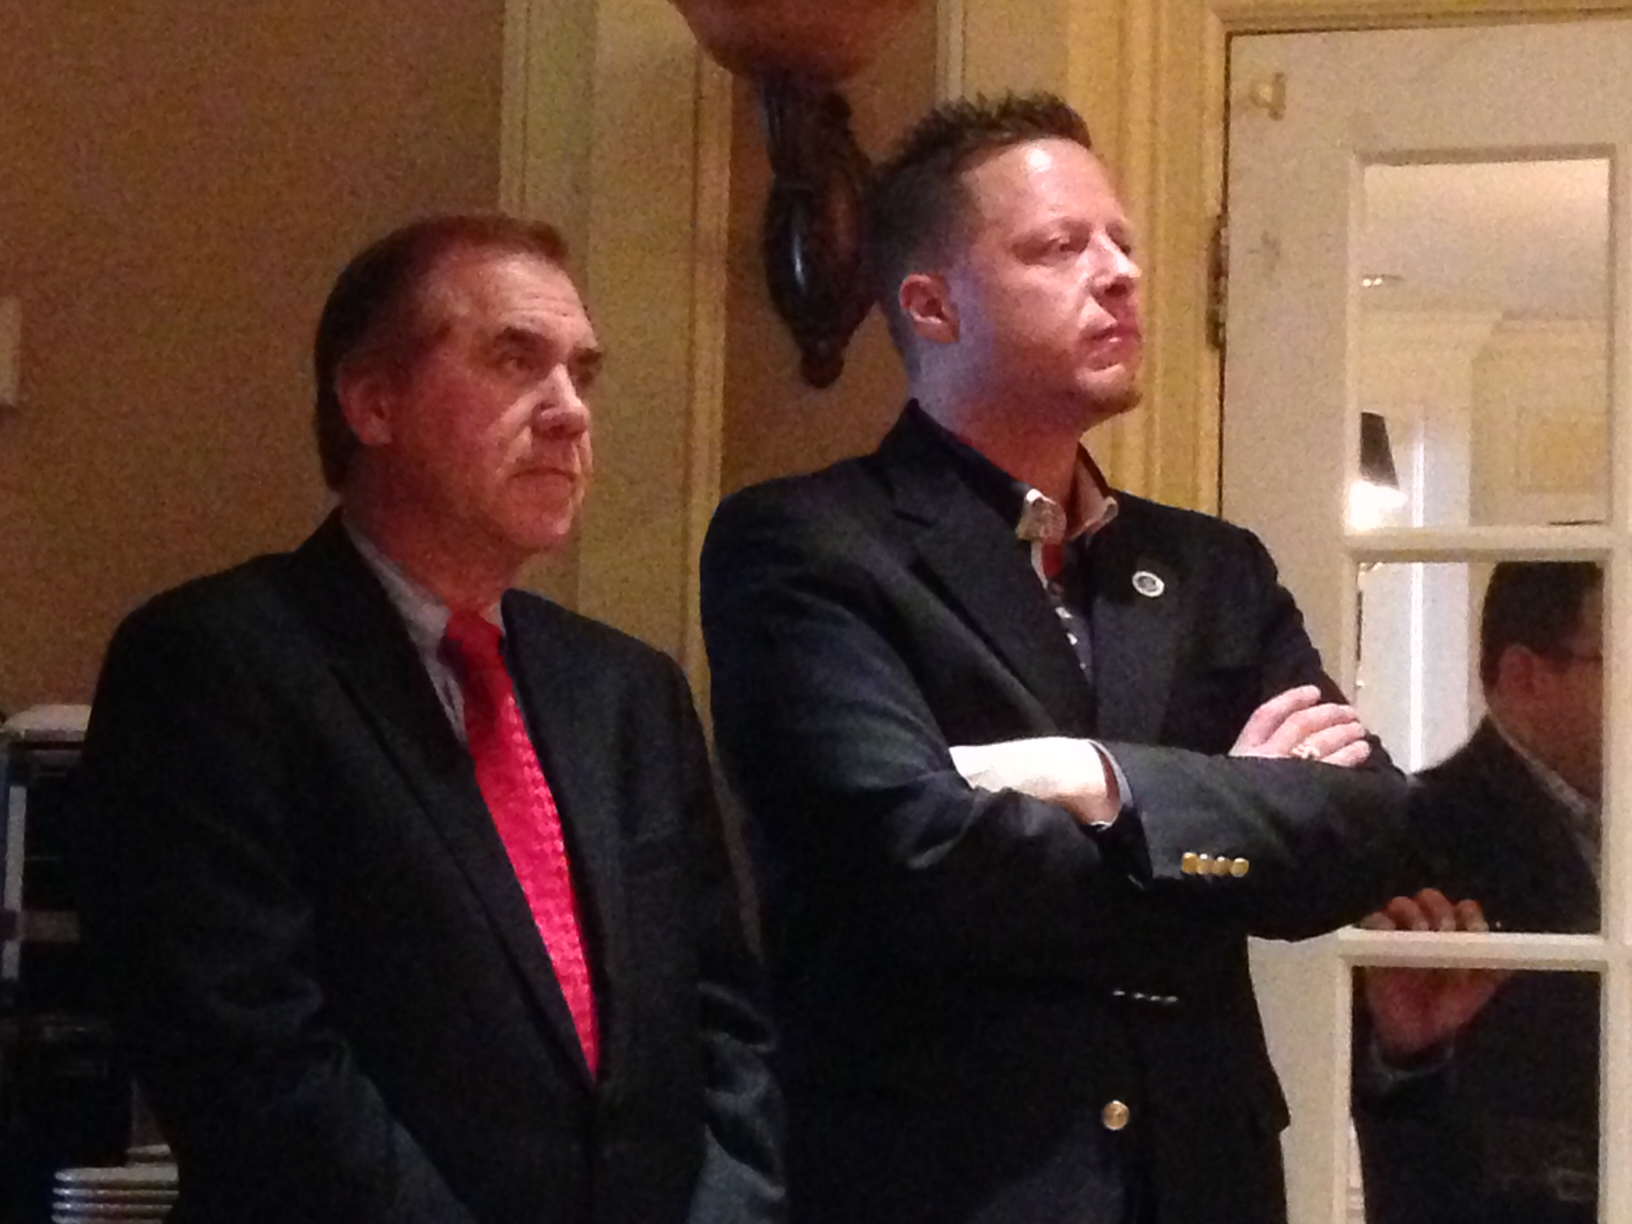 Assemblyman Craig Coughlin (left) and Mayor Dan Reiman.